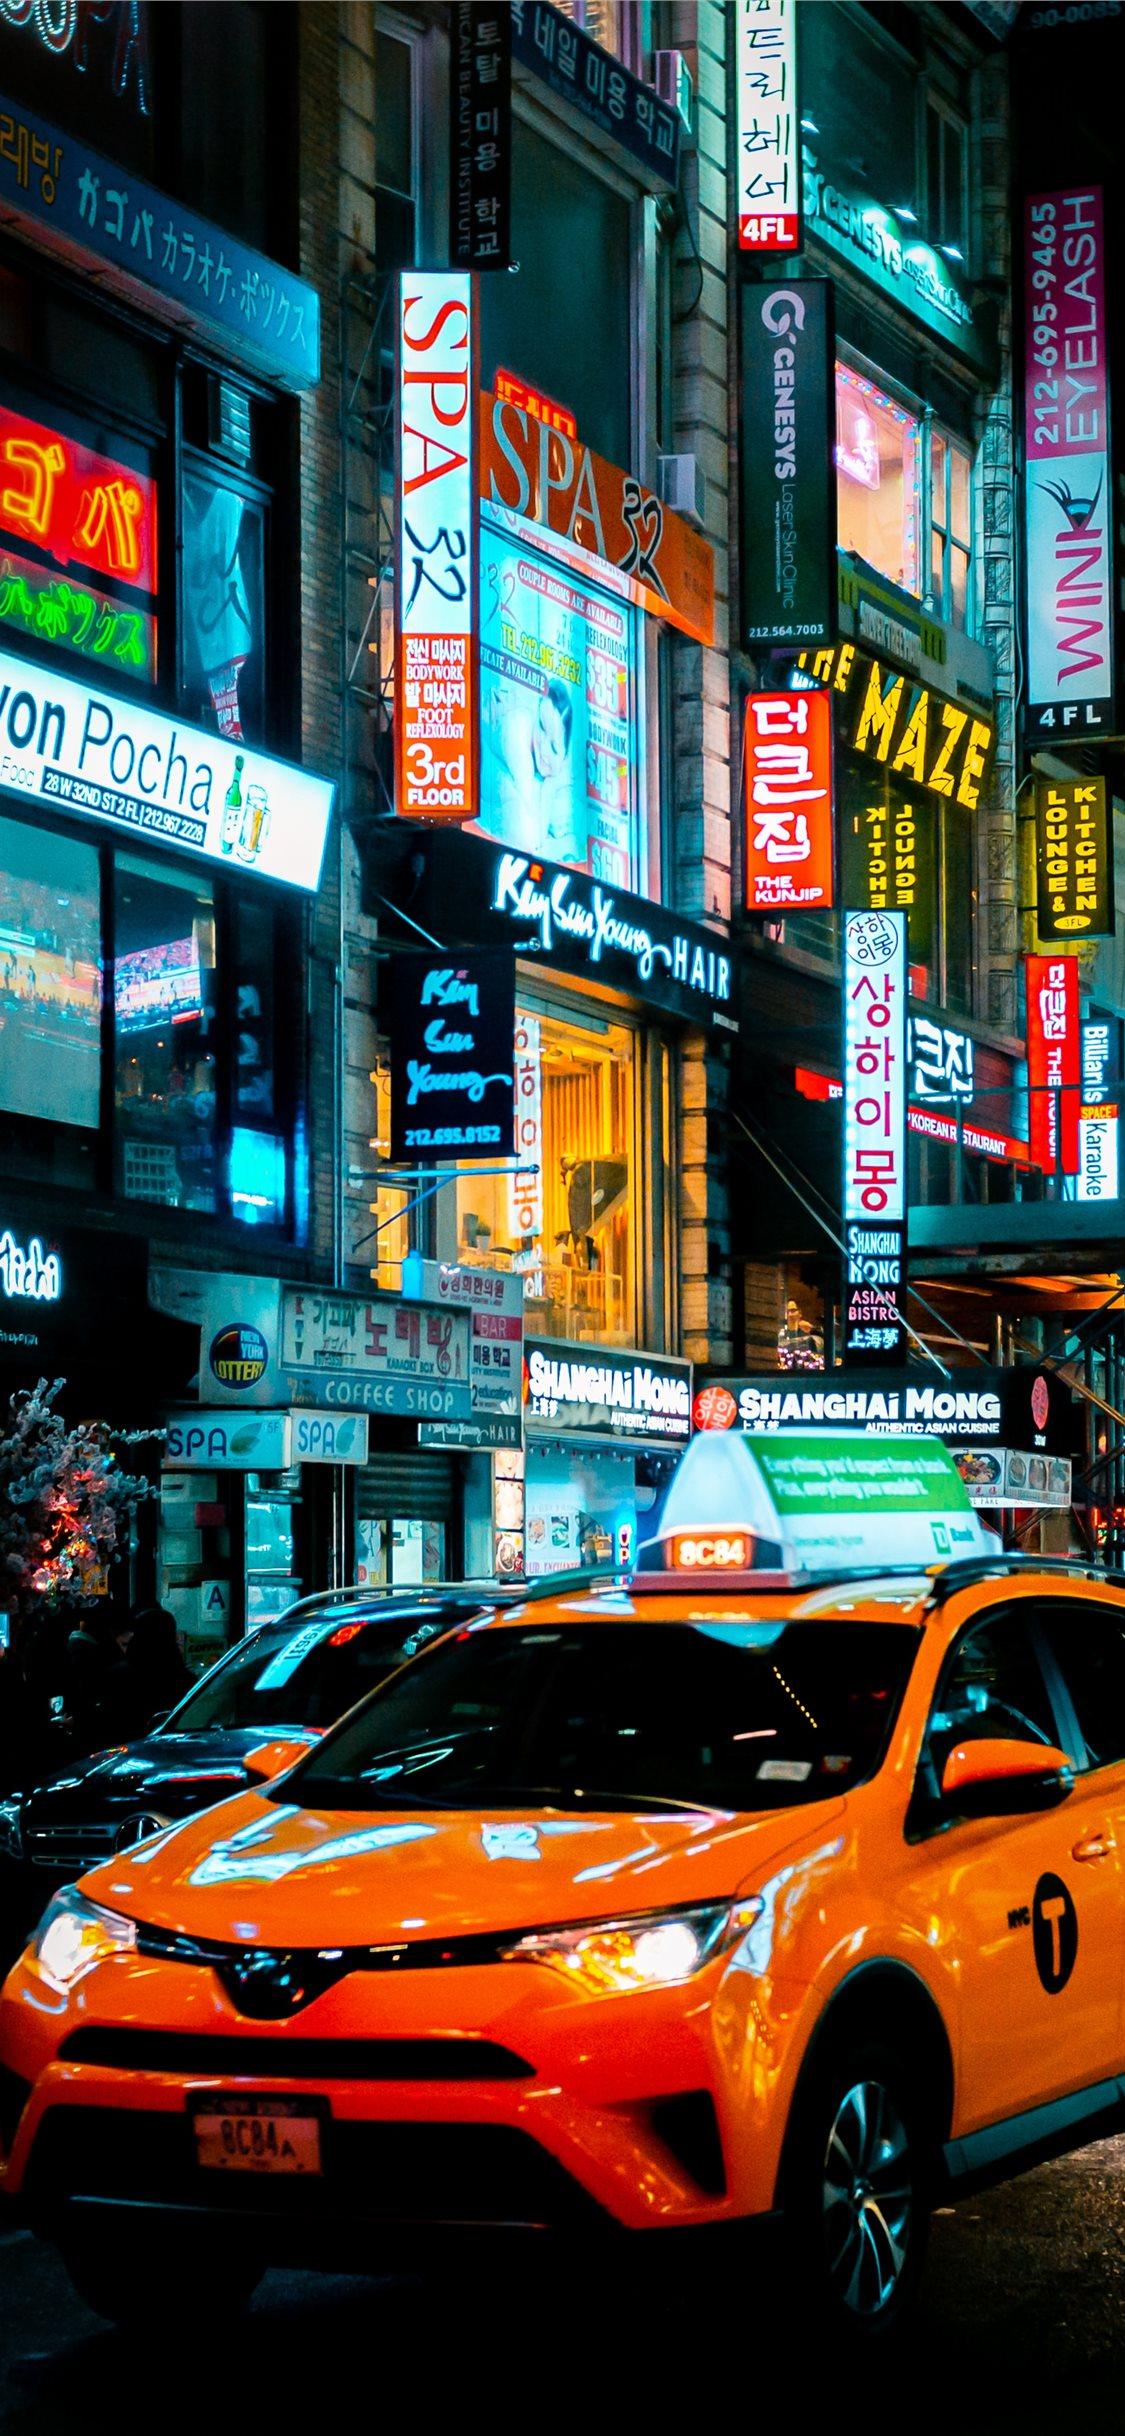 Koreatown Nyc David Wa Iphone X Wallpapers Free Download